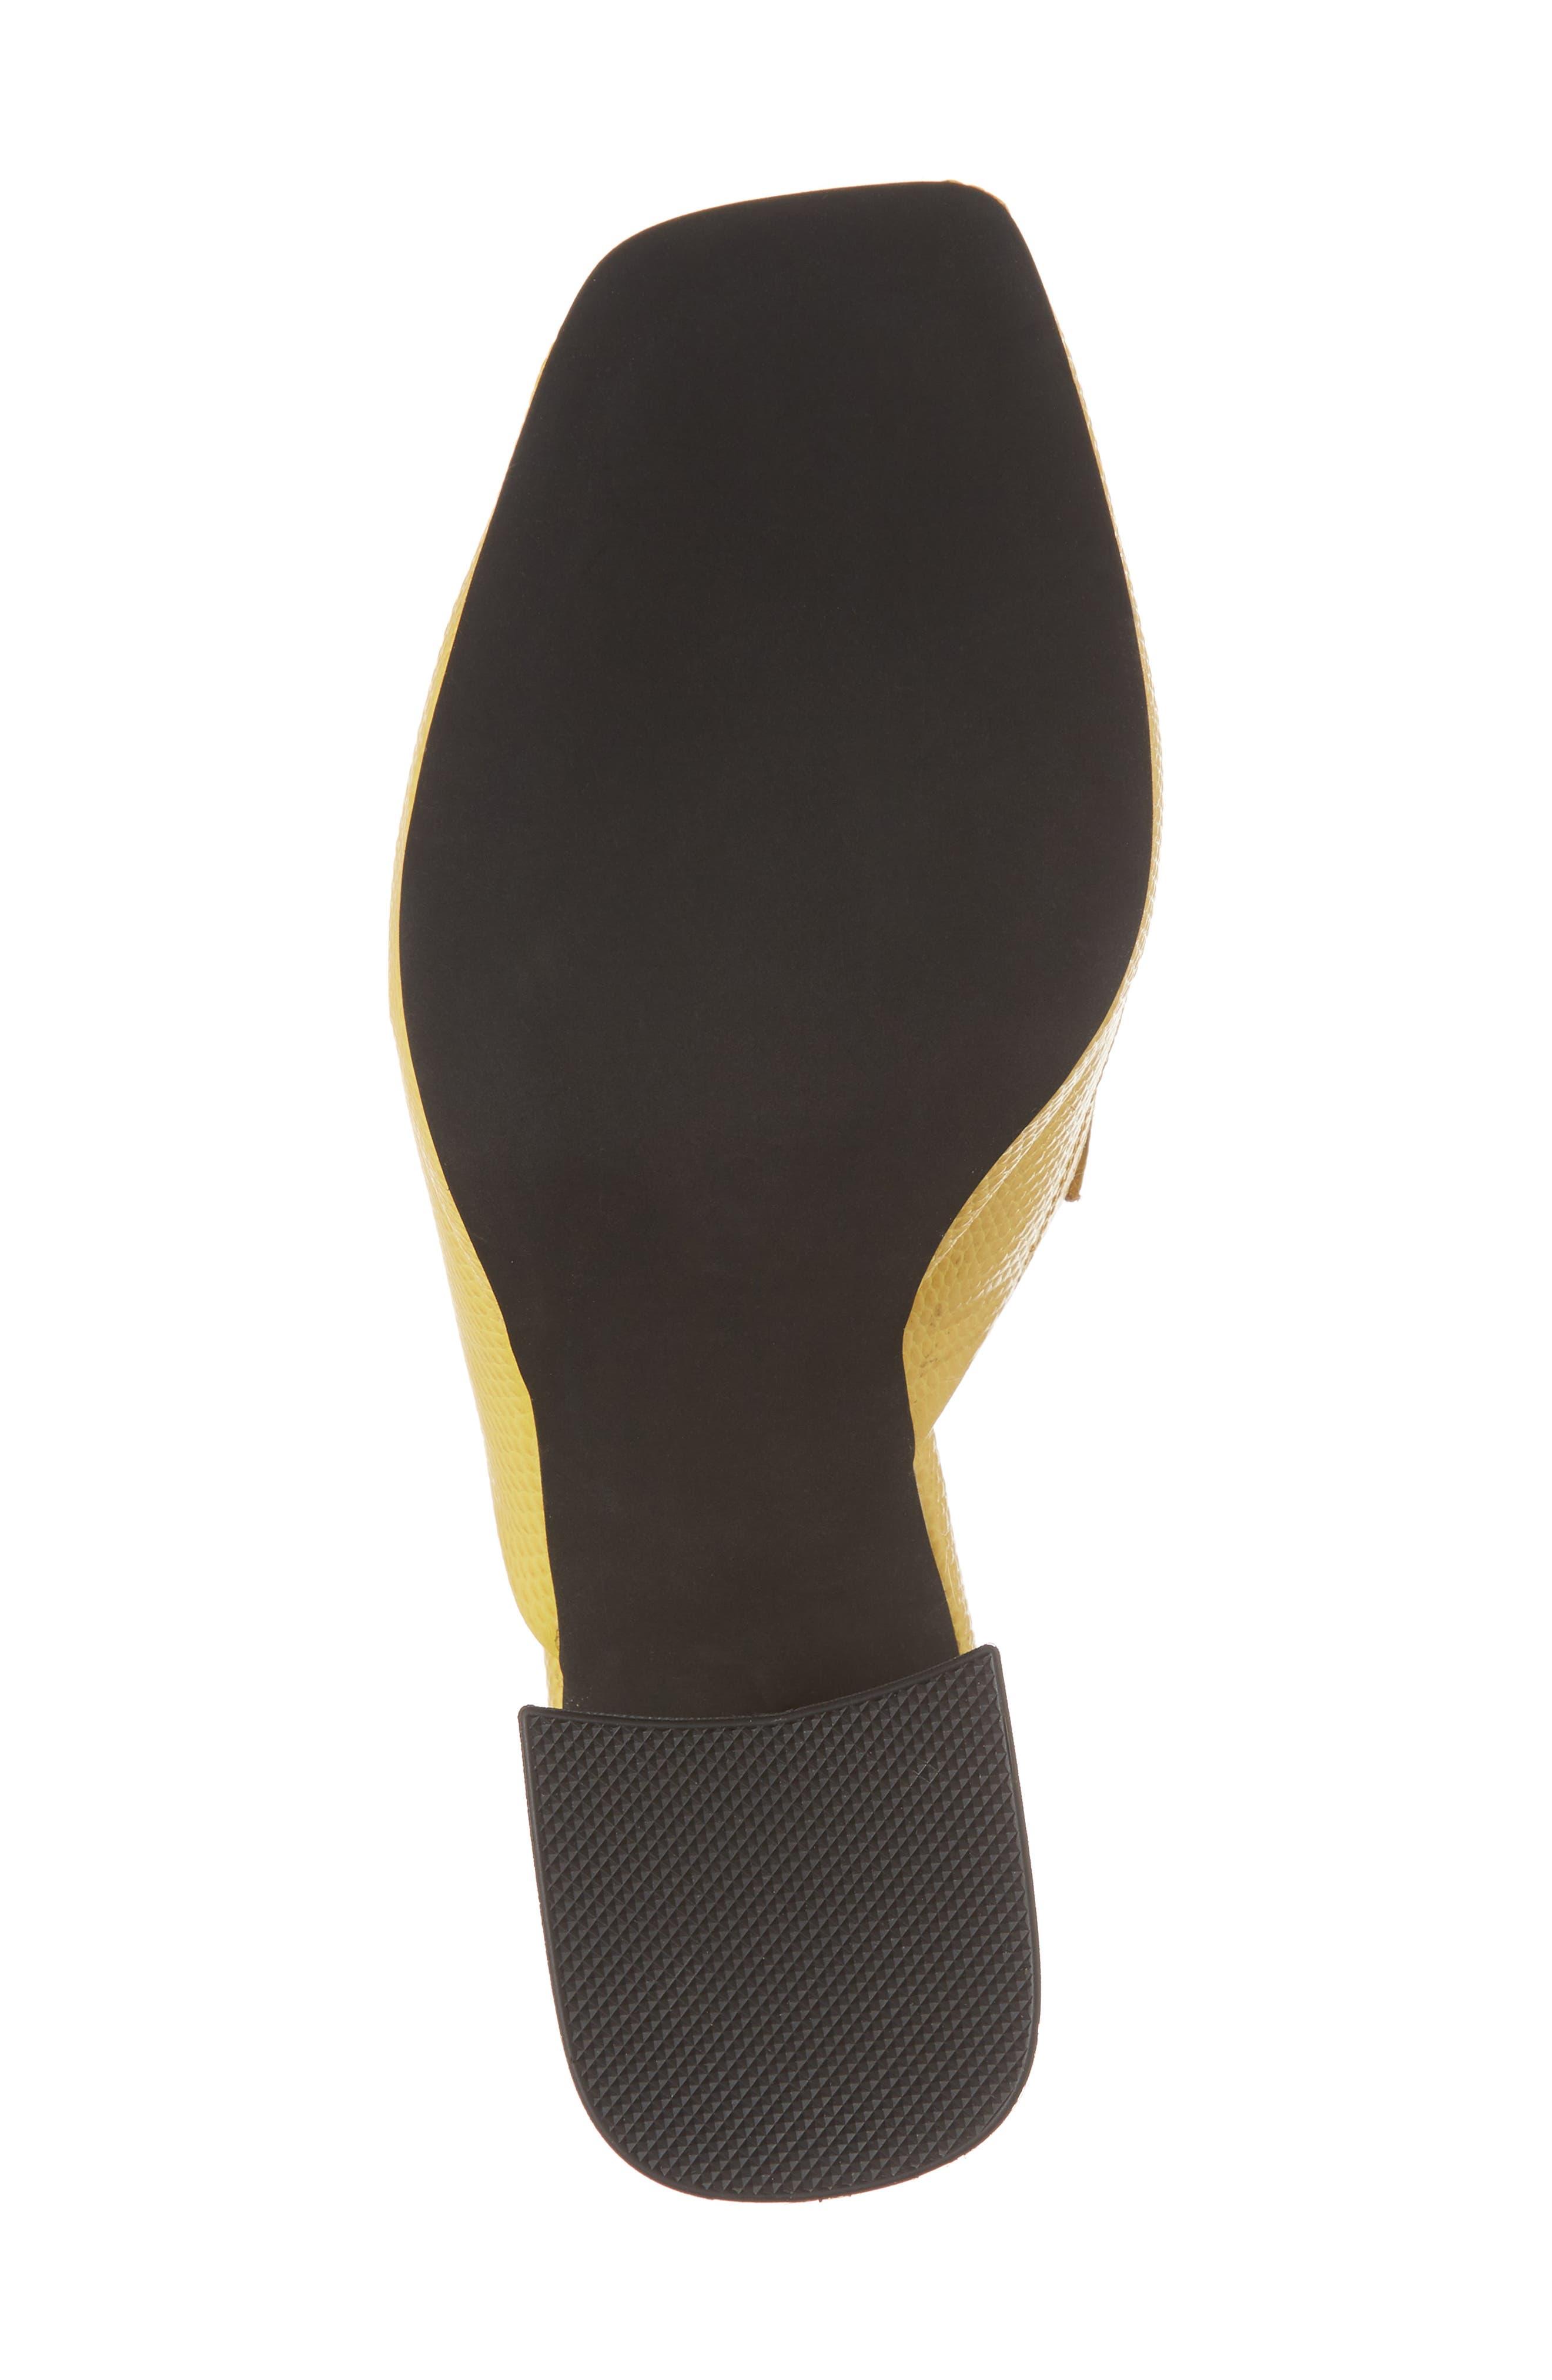 Suzuci Sandal,                             Alternate thumbnail 6, color,                             Yellow Leather